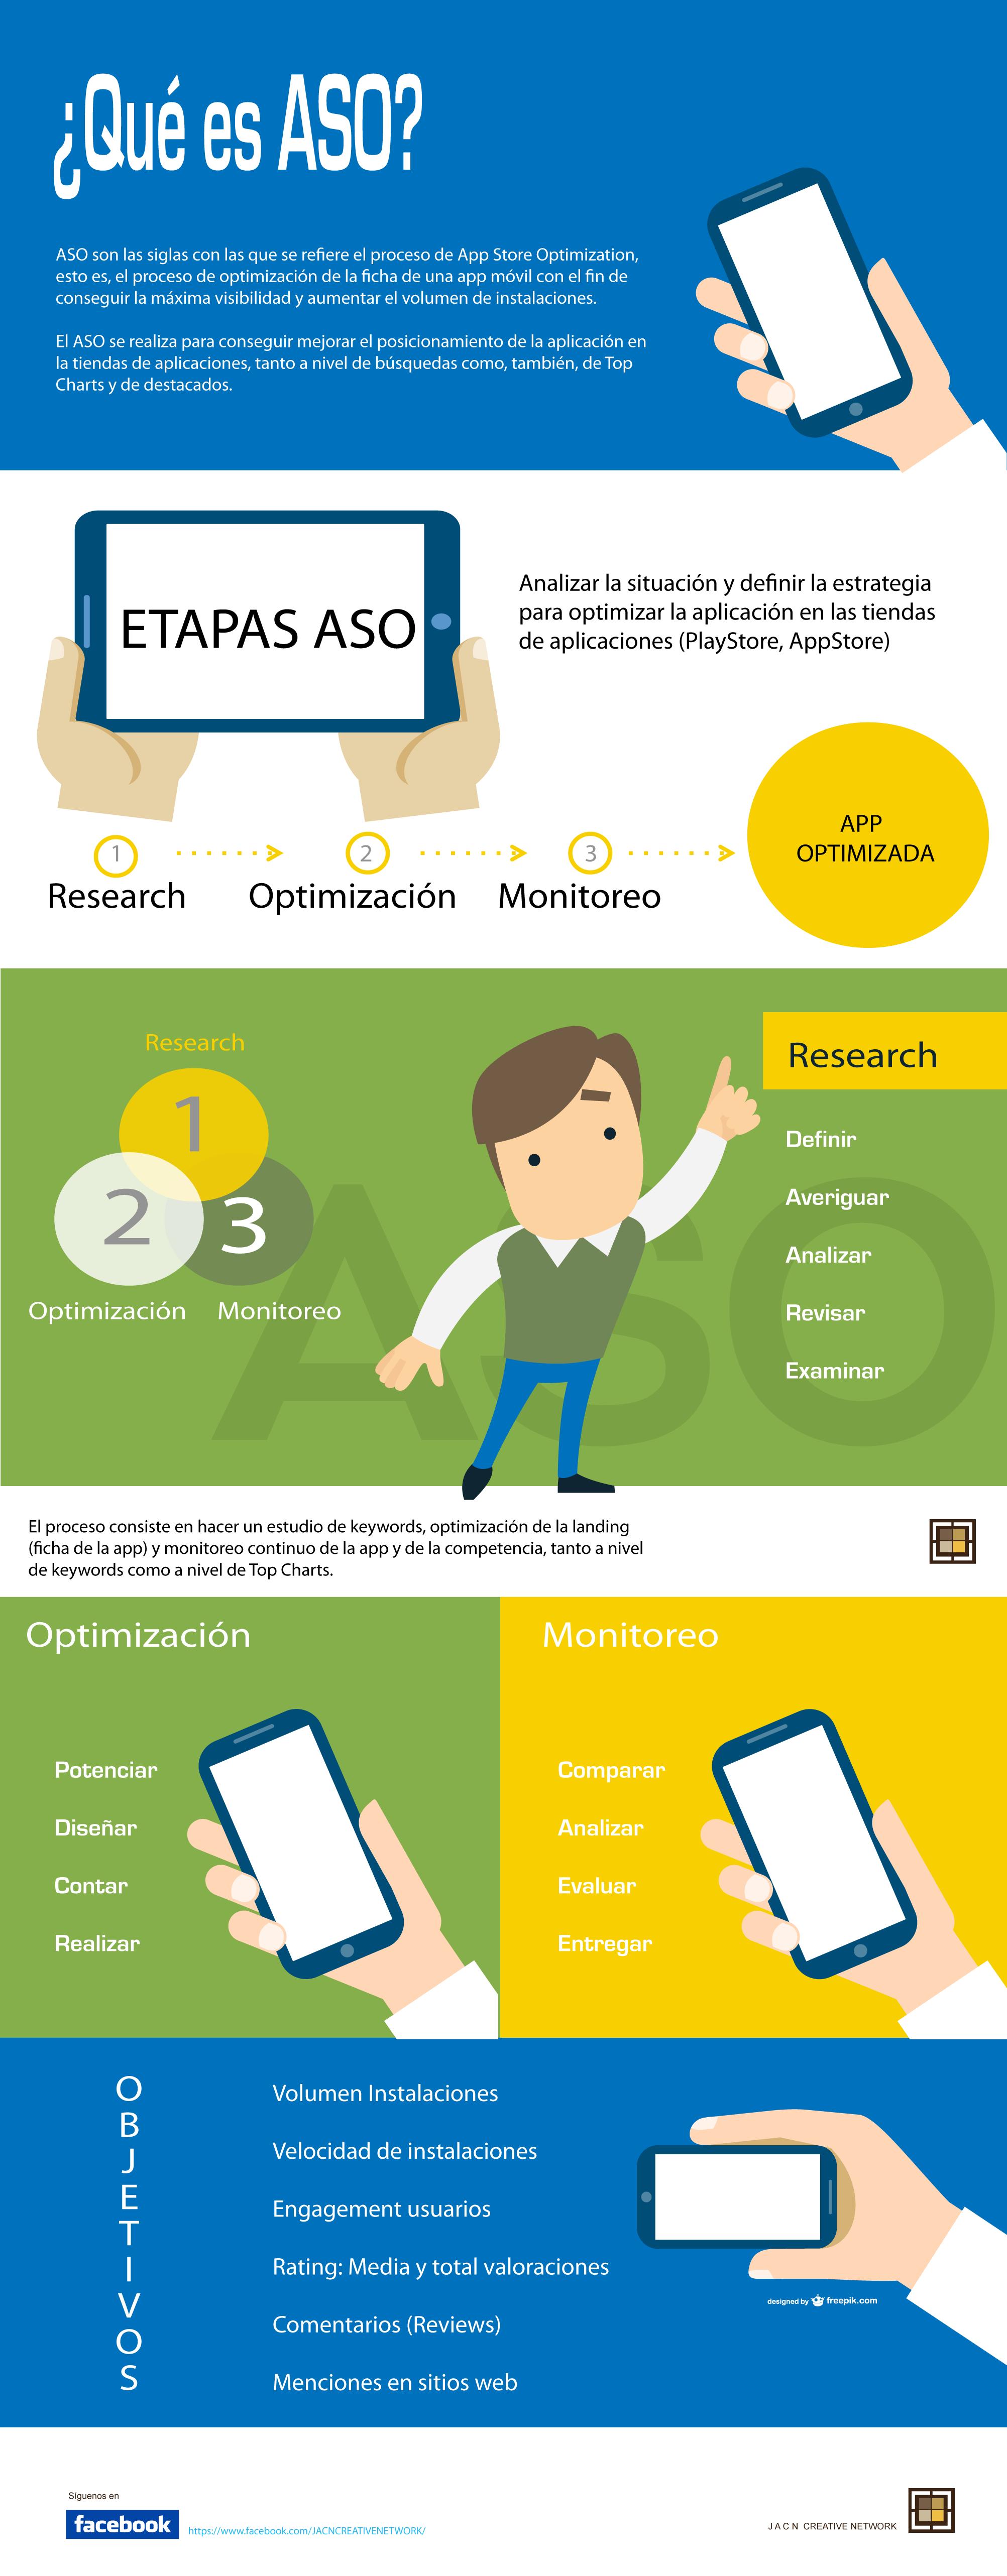 Qué es ASO App Store Optimization #infografia #infographic #seo